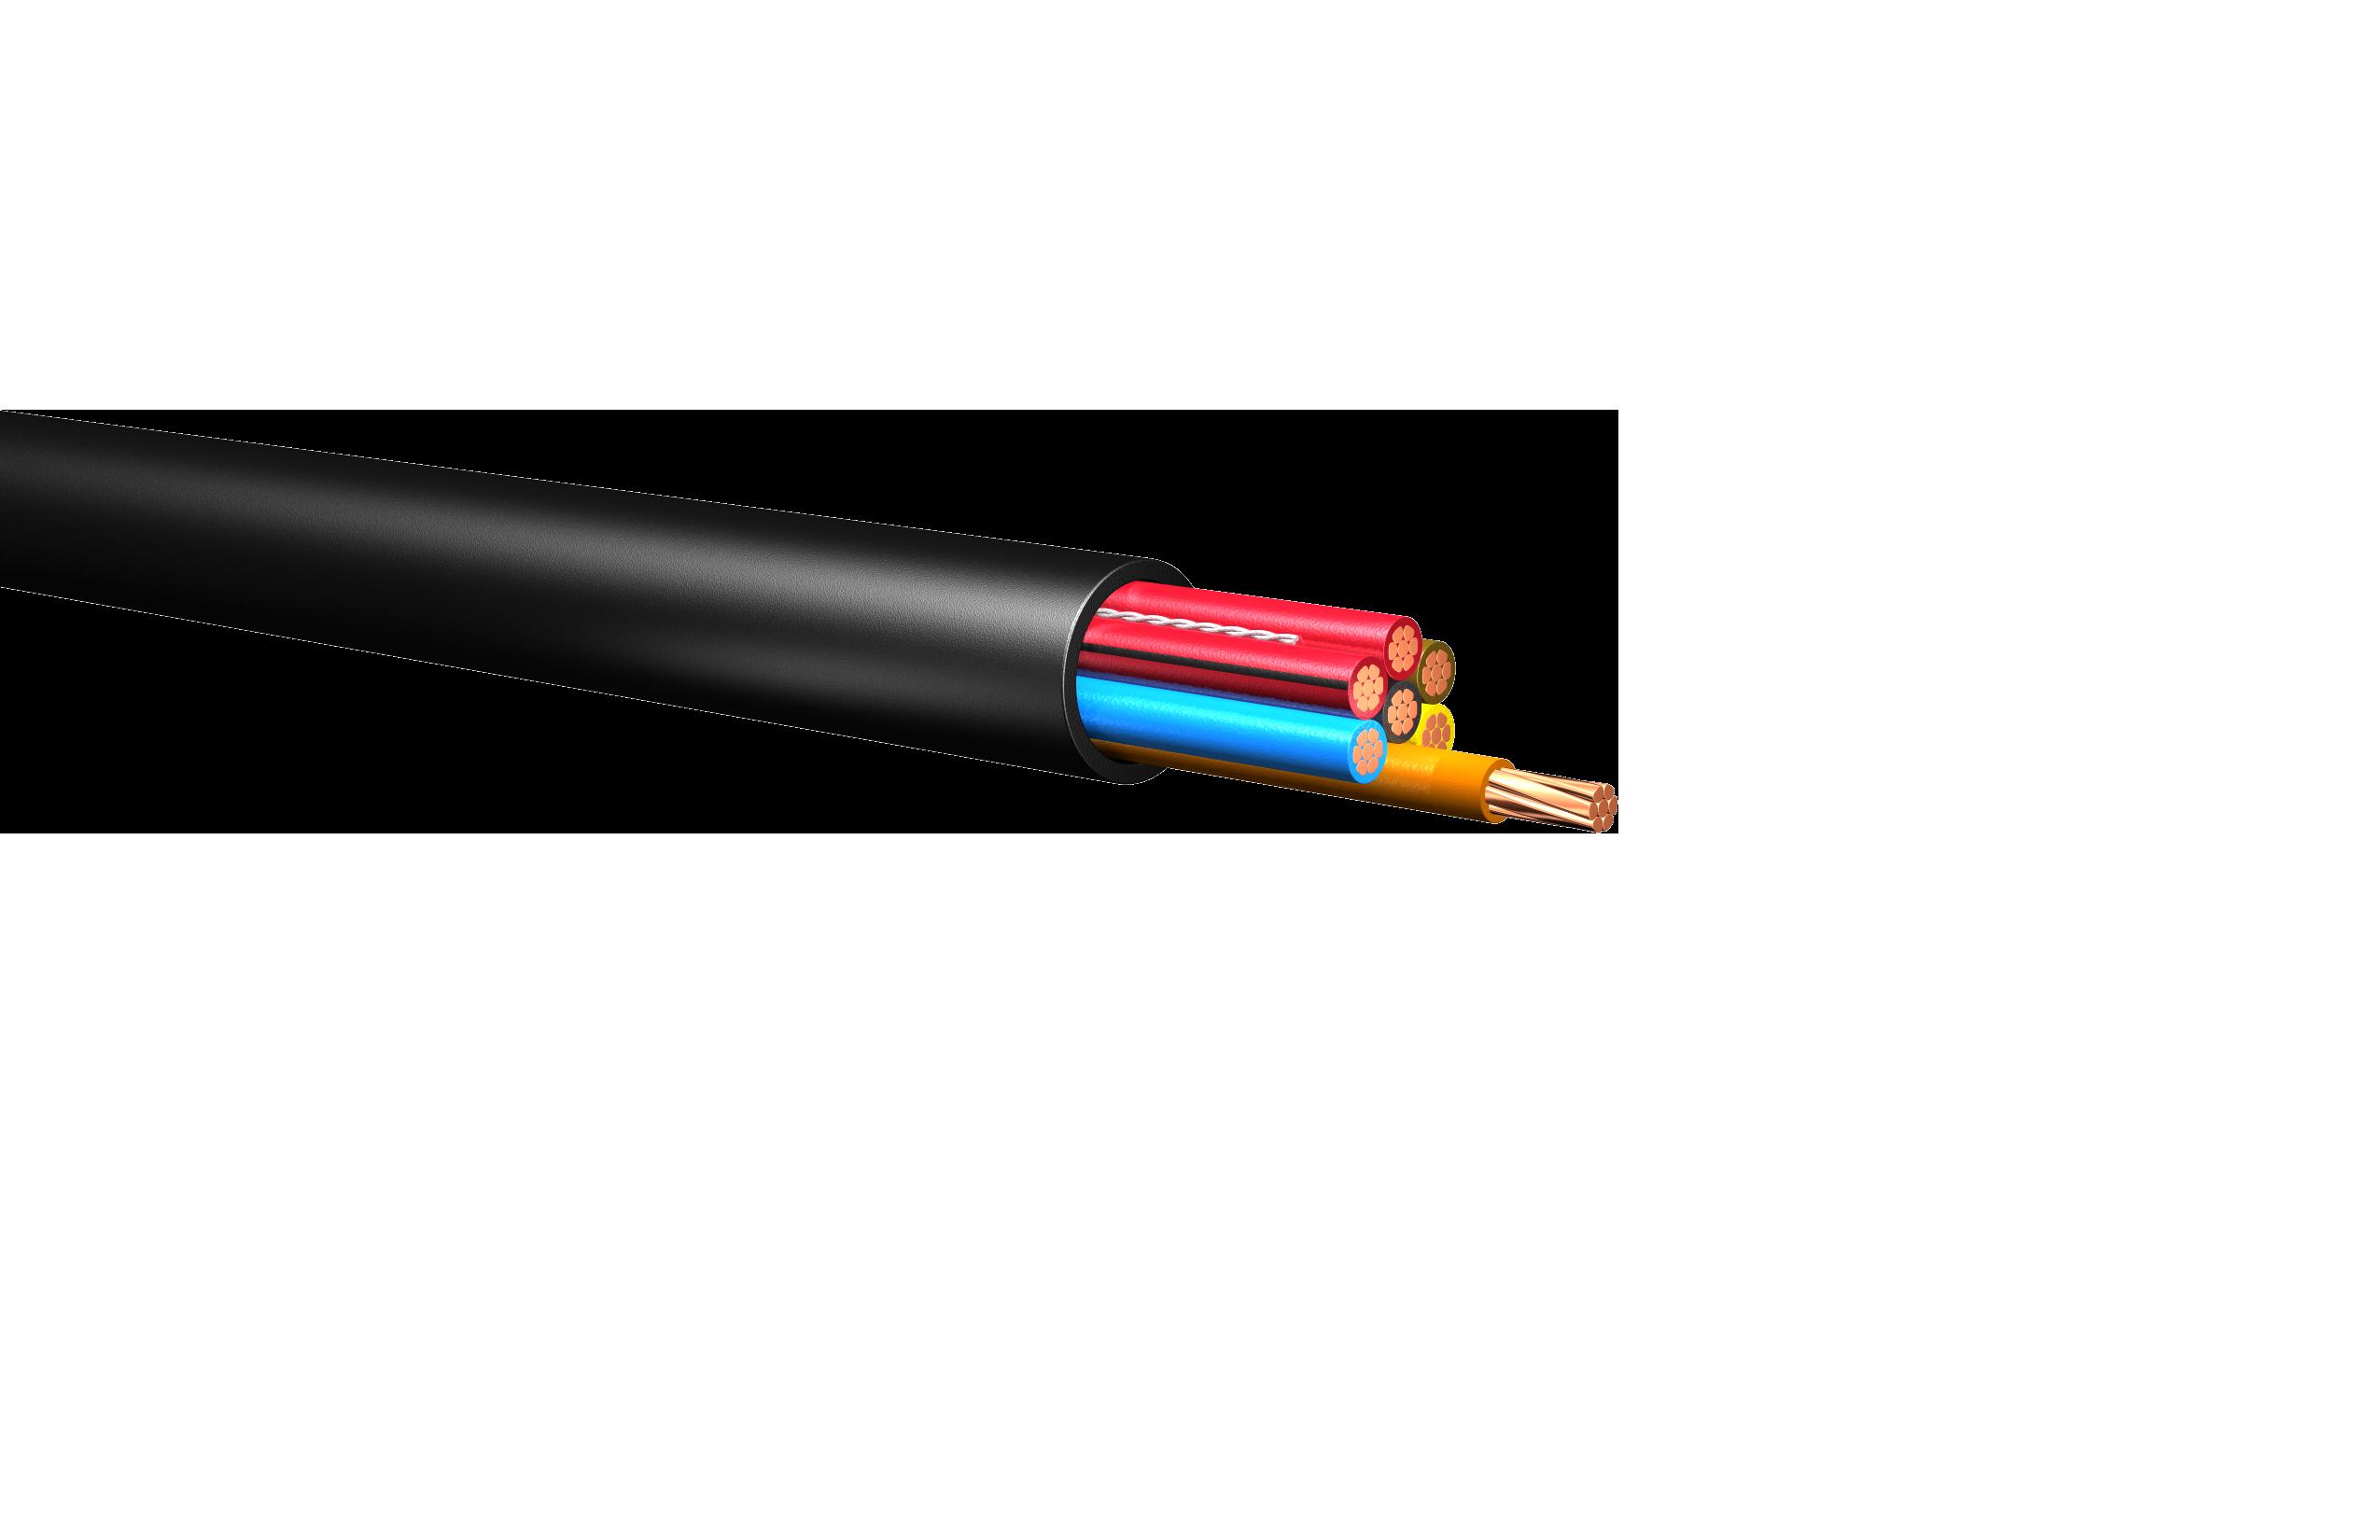 HW151: 600V Control Cable, THHN or THWN-2, PVC/Nylon (14-10 AWG ...